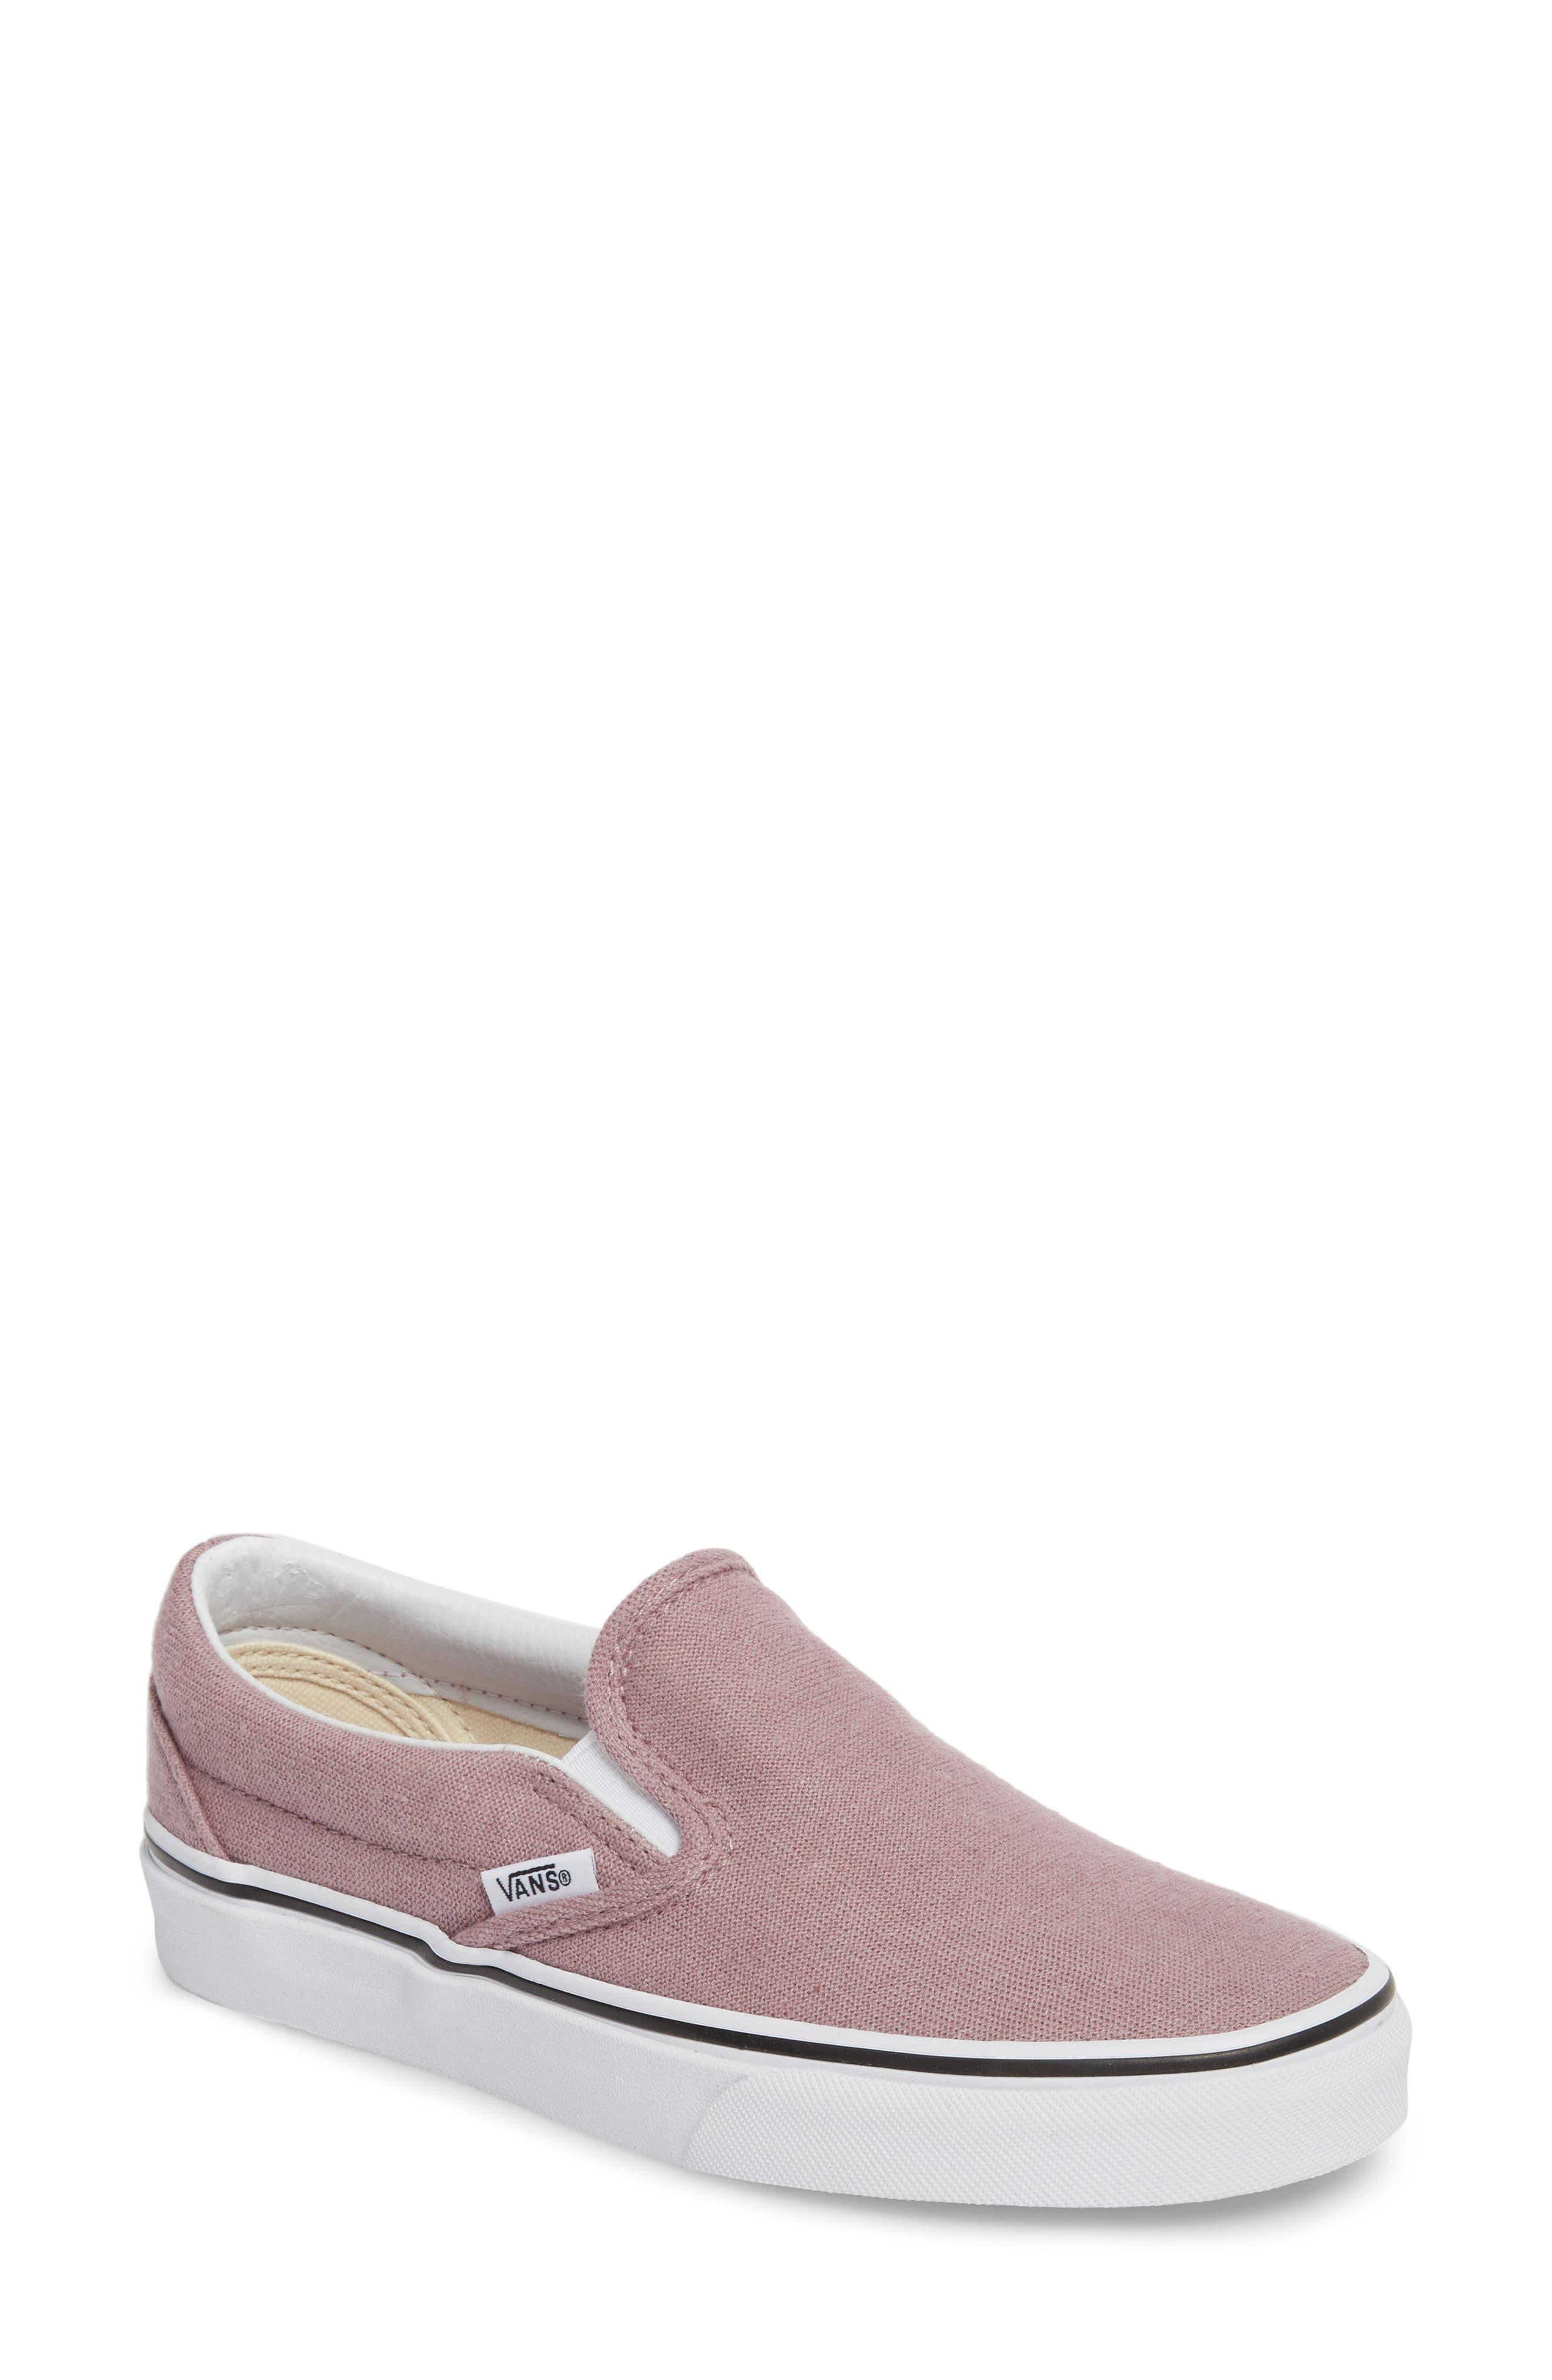 ,                             Classic Slip-On Sneaker,                             Main thumbnail 171, color,                             530